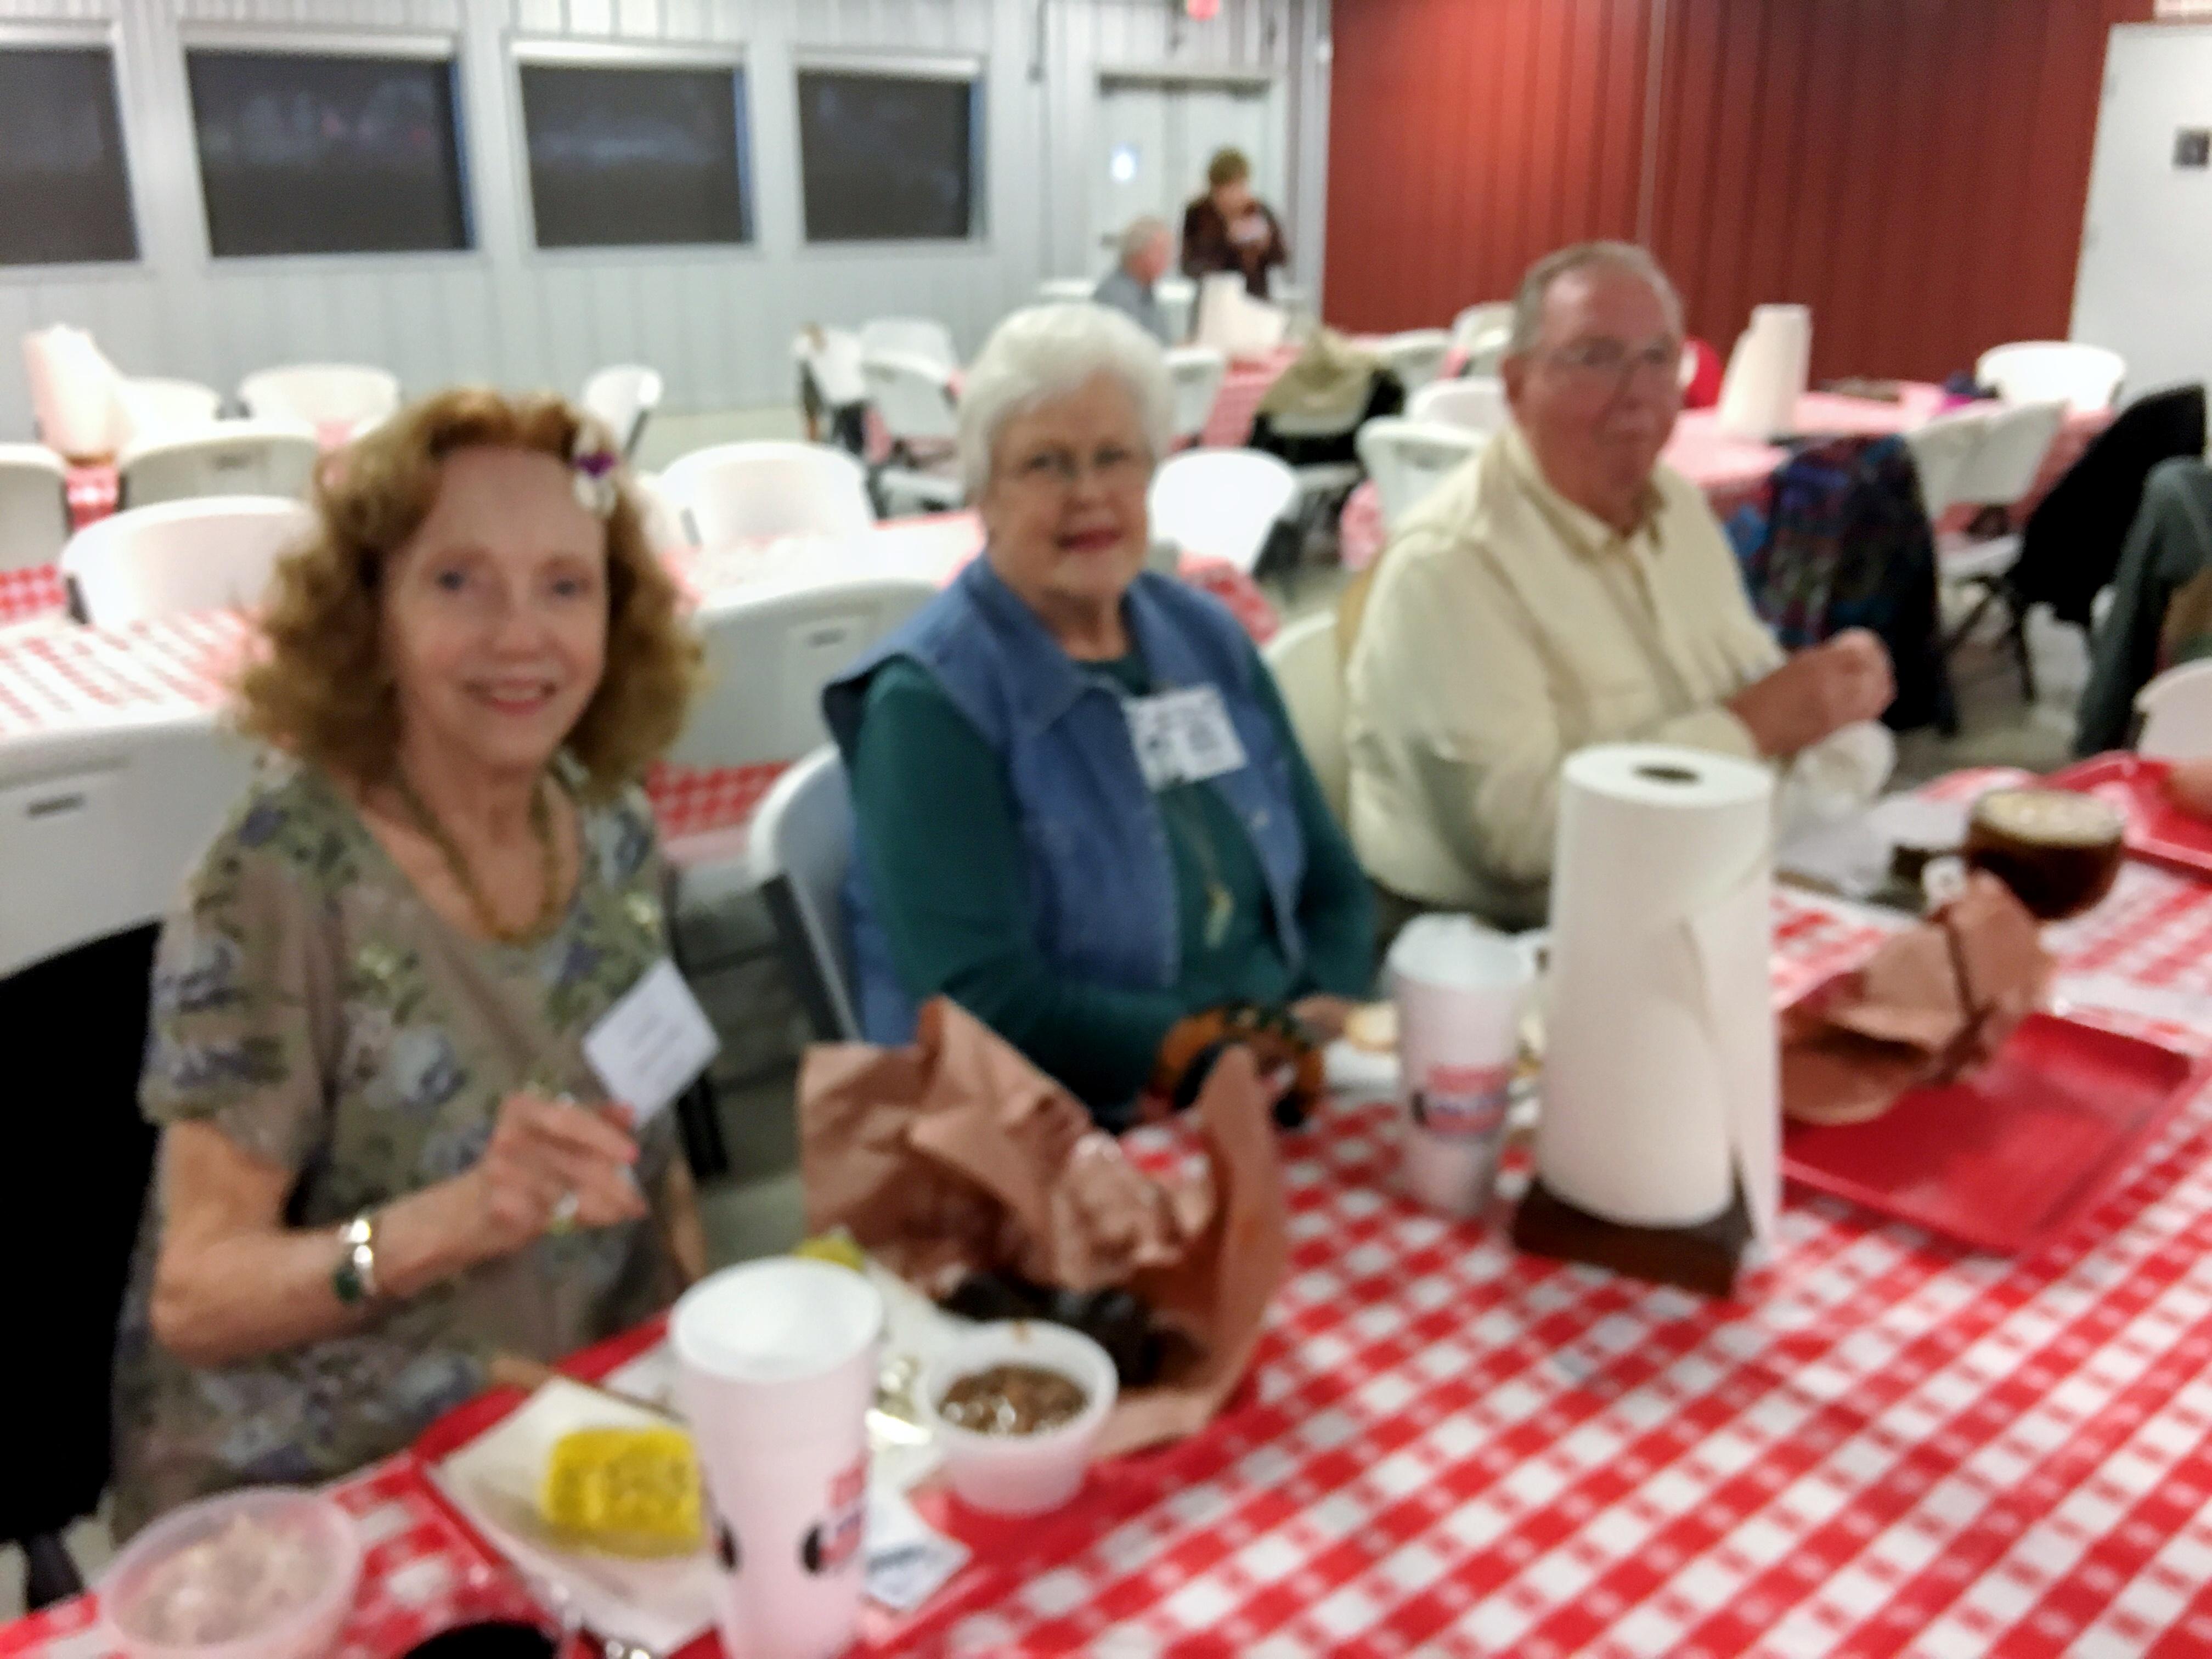 Donna Erdwurm Beard, Julie Tipton Cochran and Al Cochran